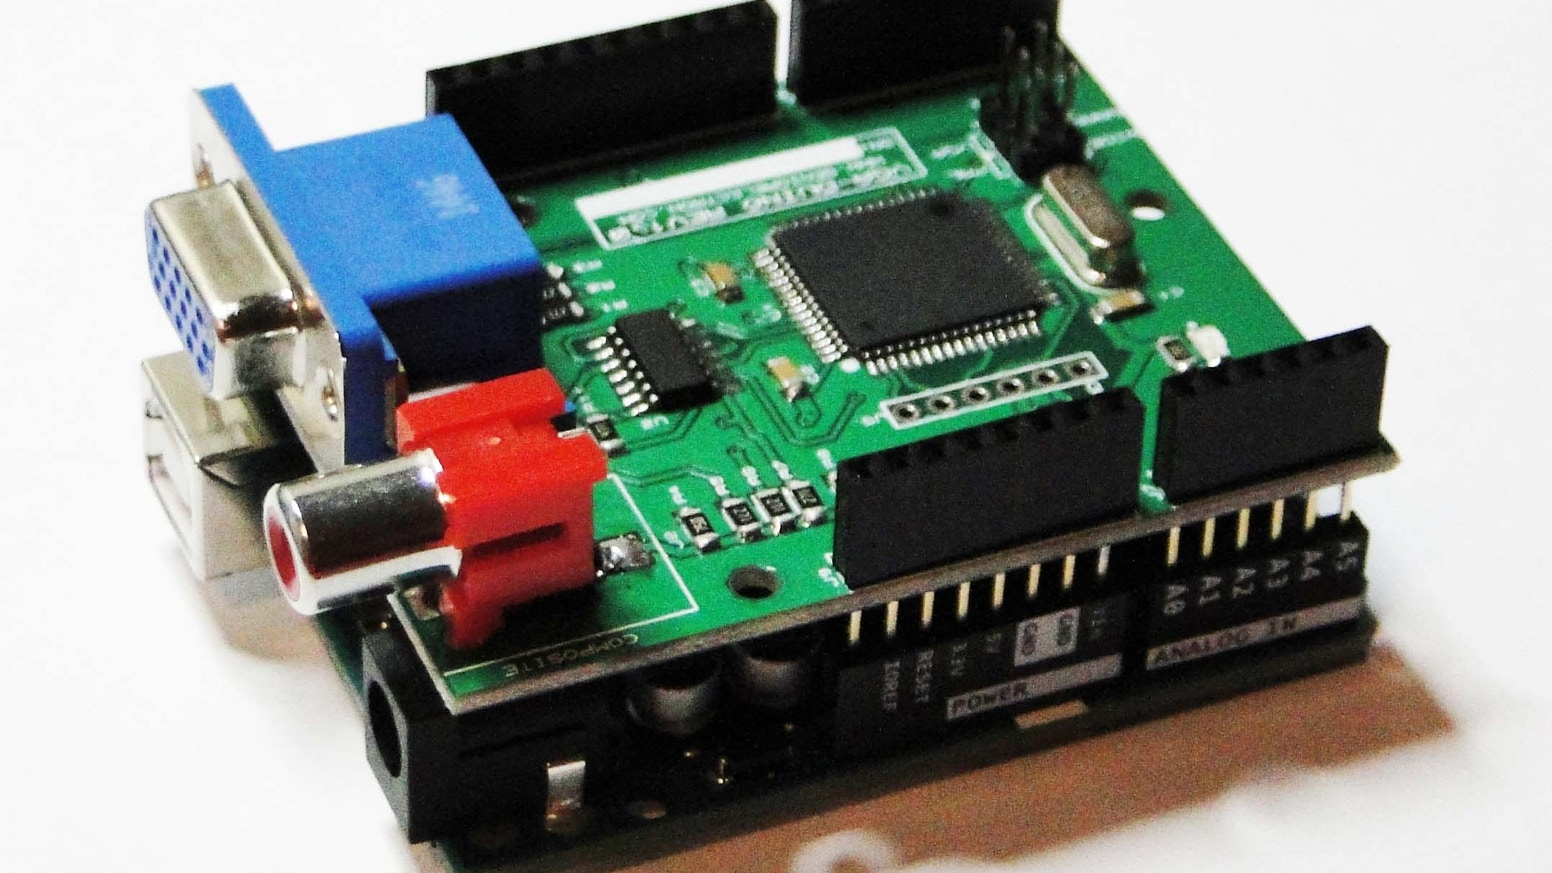 VGA GRAPHIC SHIELD FOR ARDUINO WITH RGB/AV TV/MONITOR PORTS